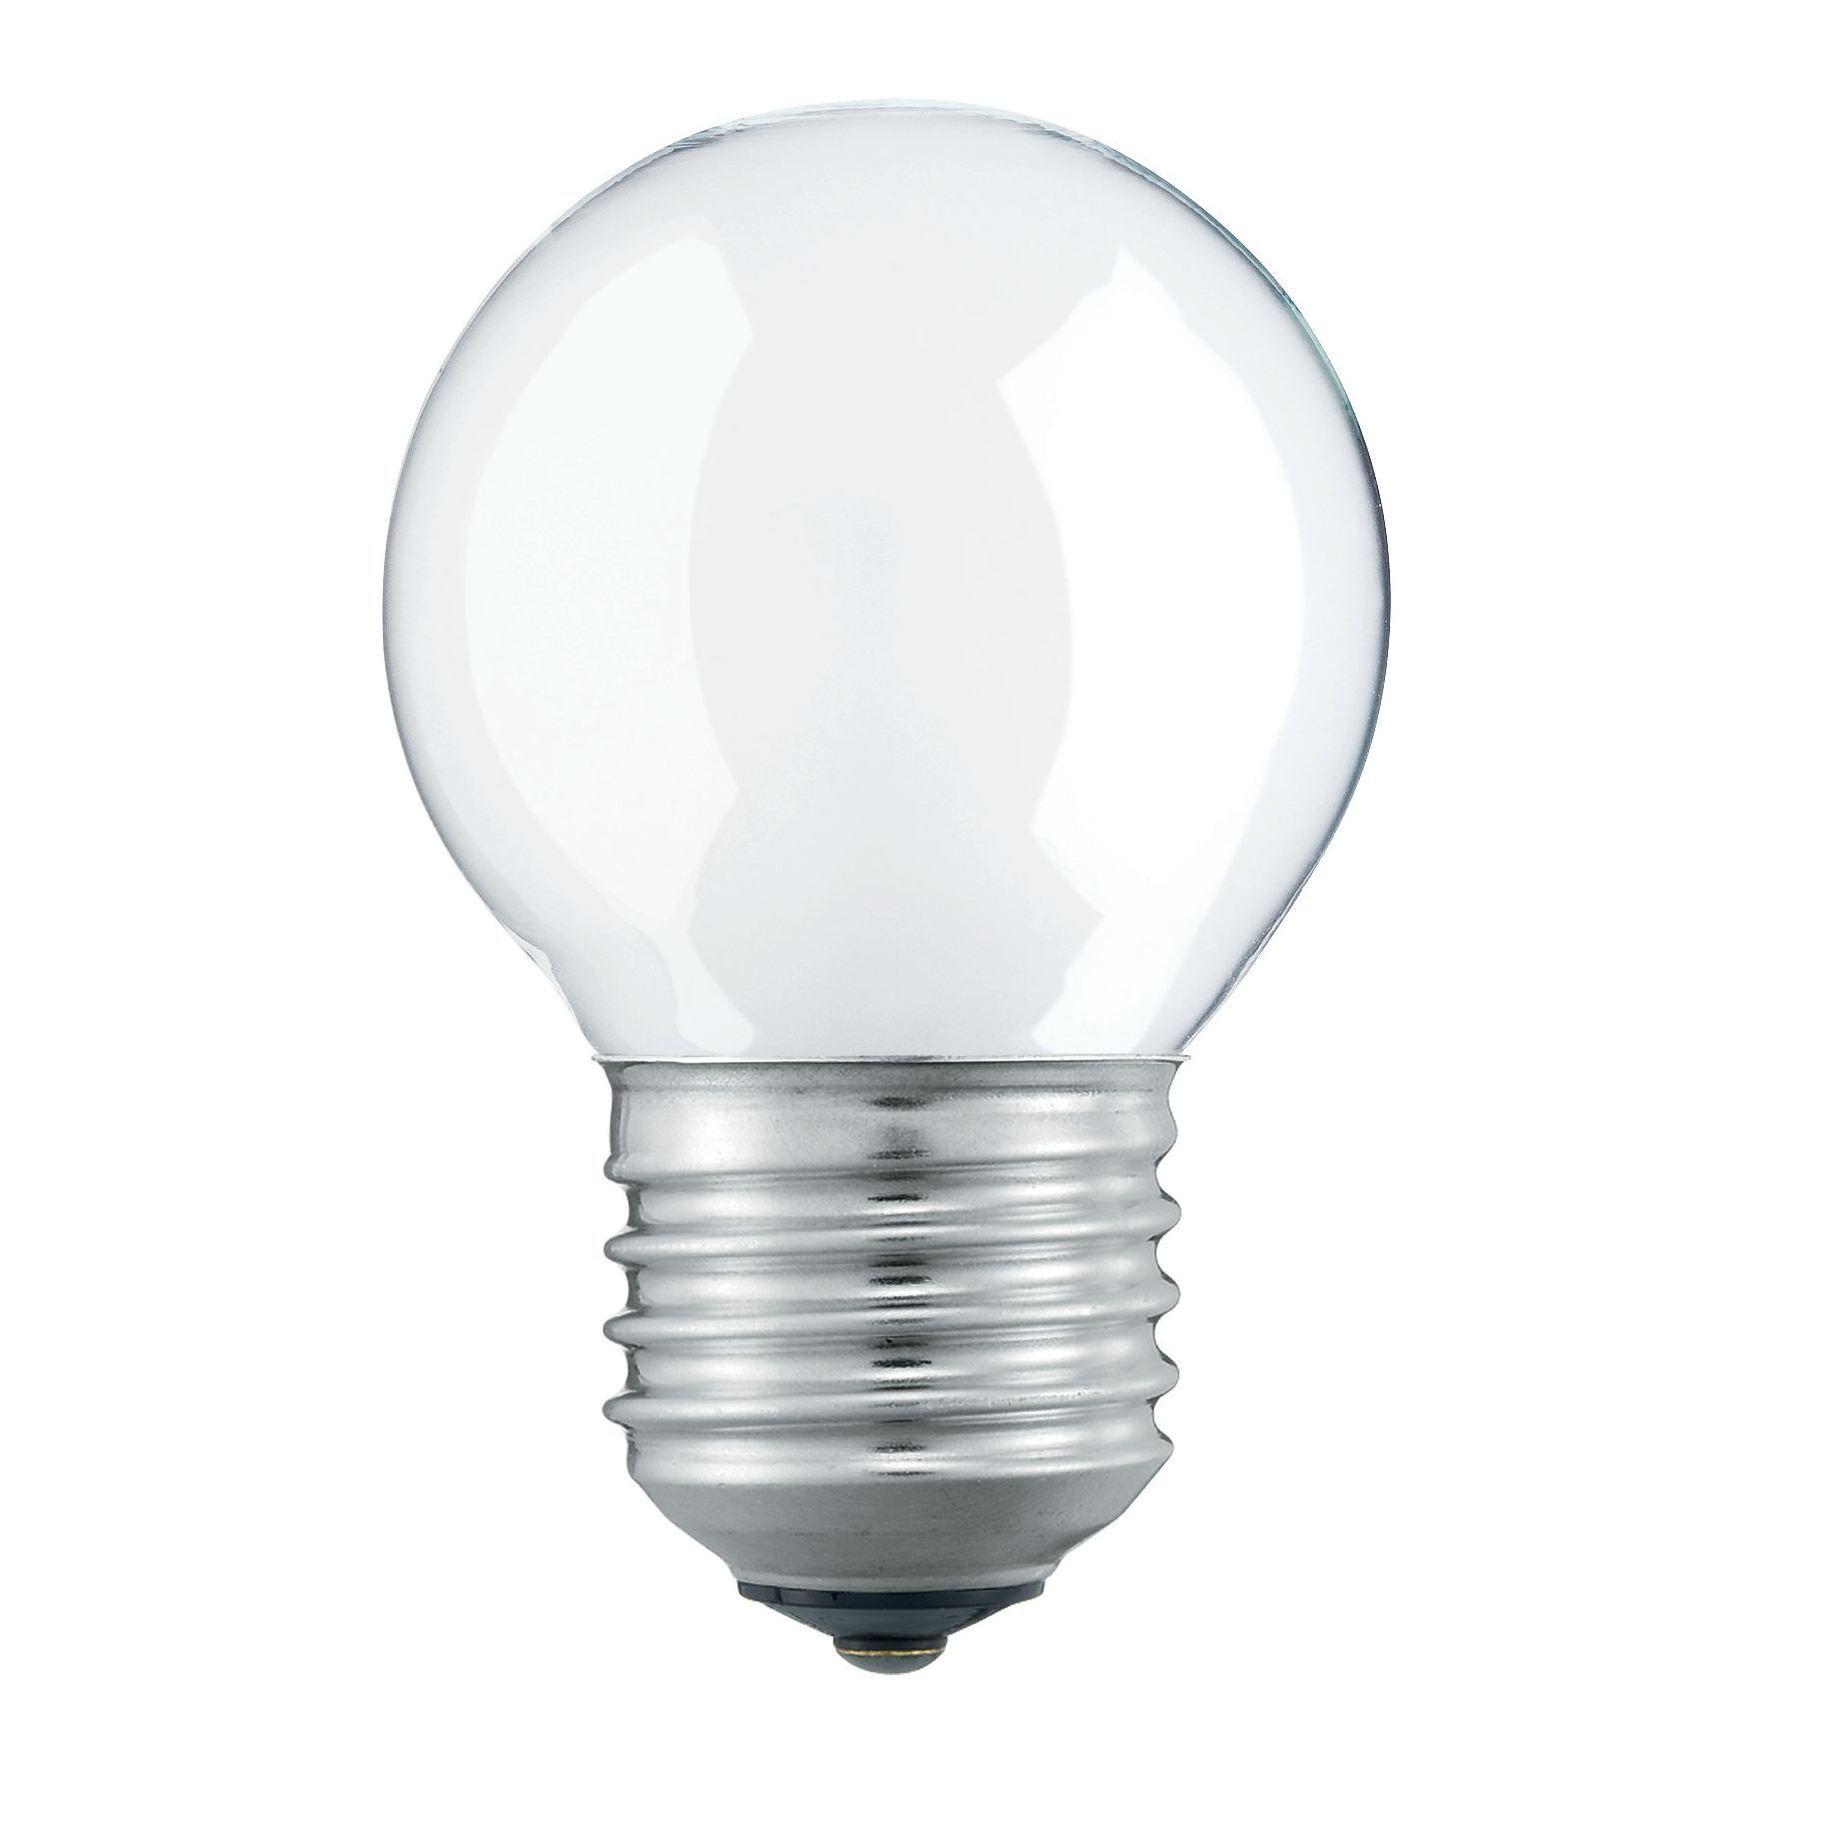 Купить Лампа накаливания Philips 40W E27 230V P45 FR 1CT/10X10 матовая